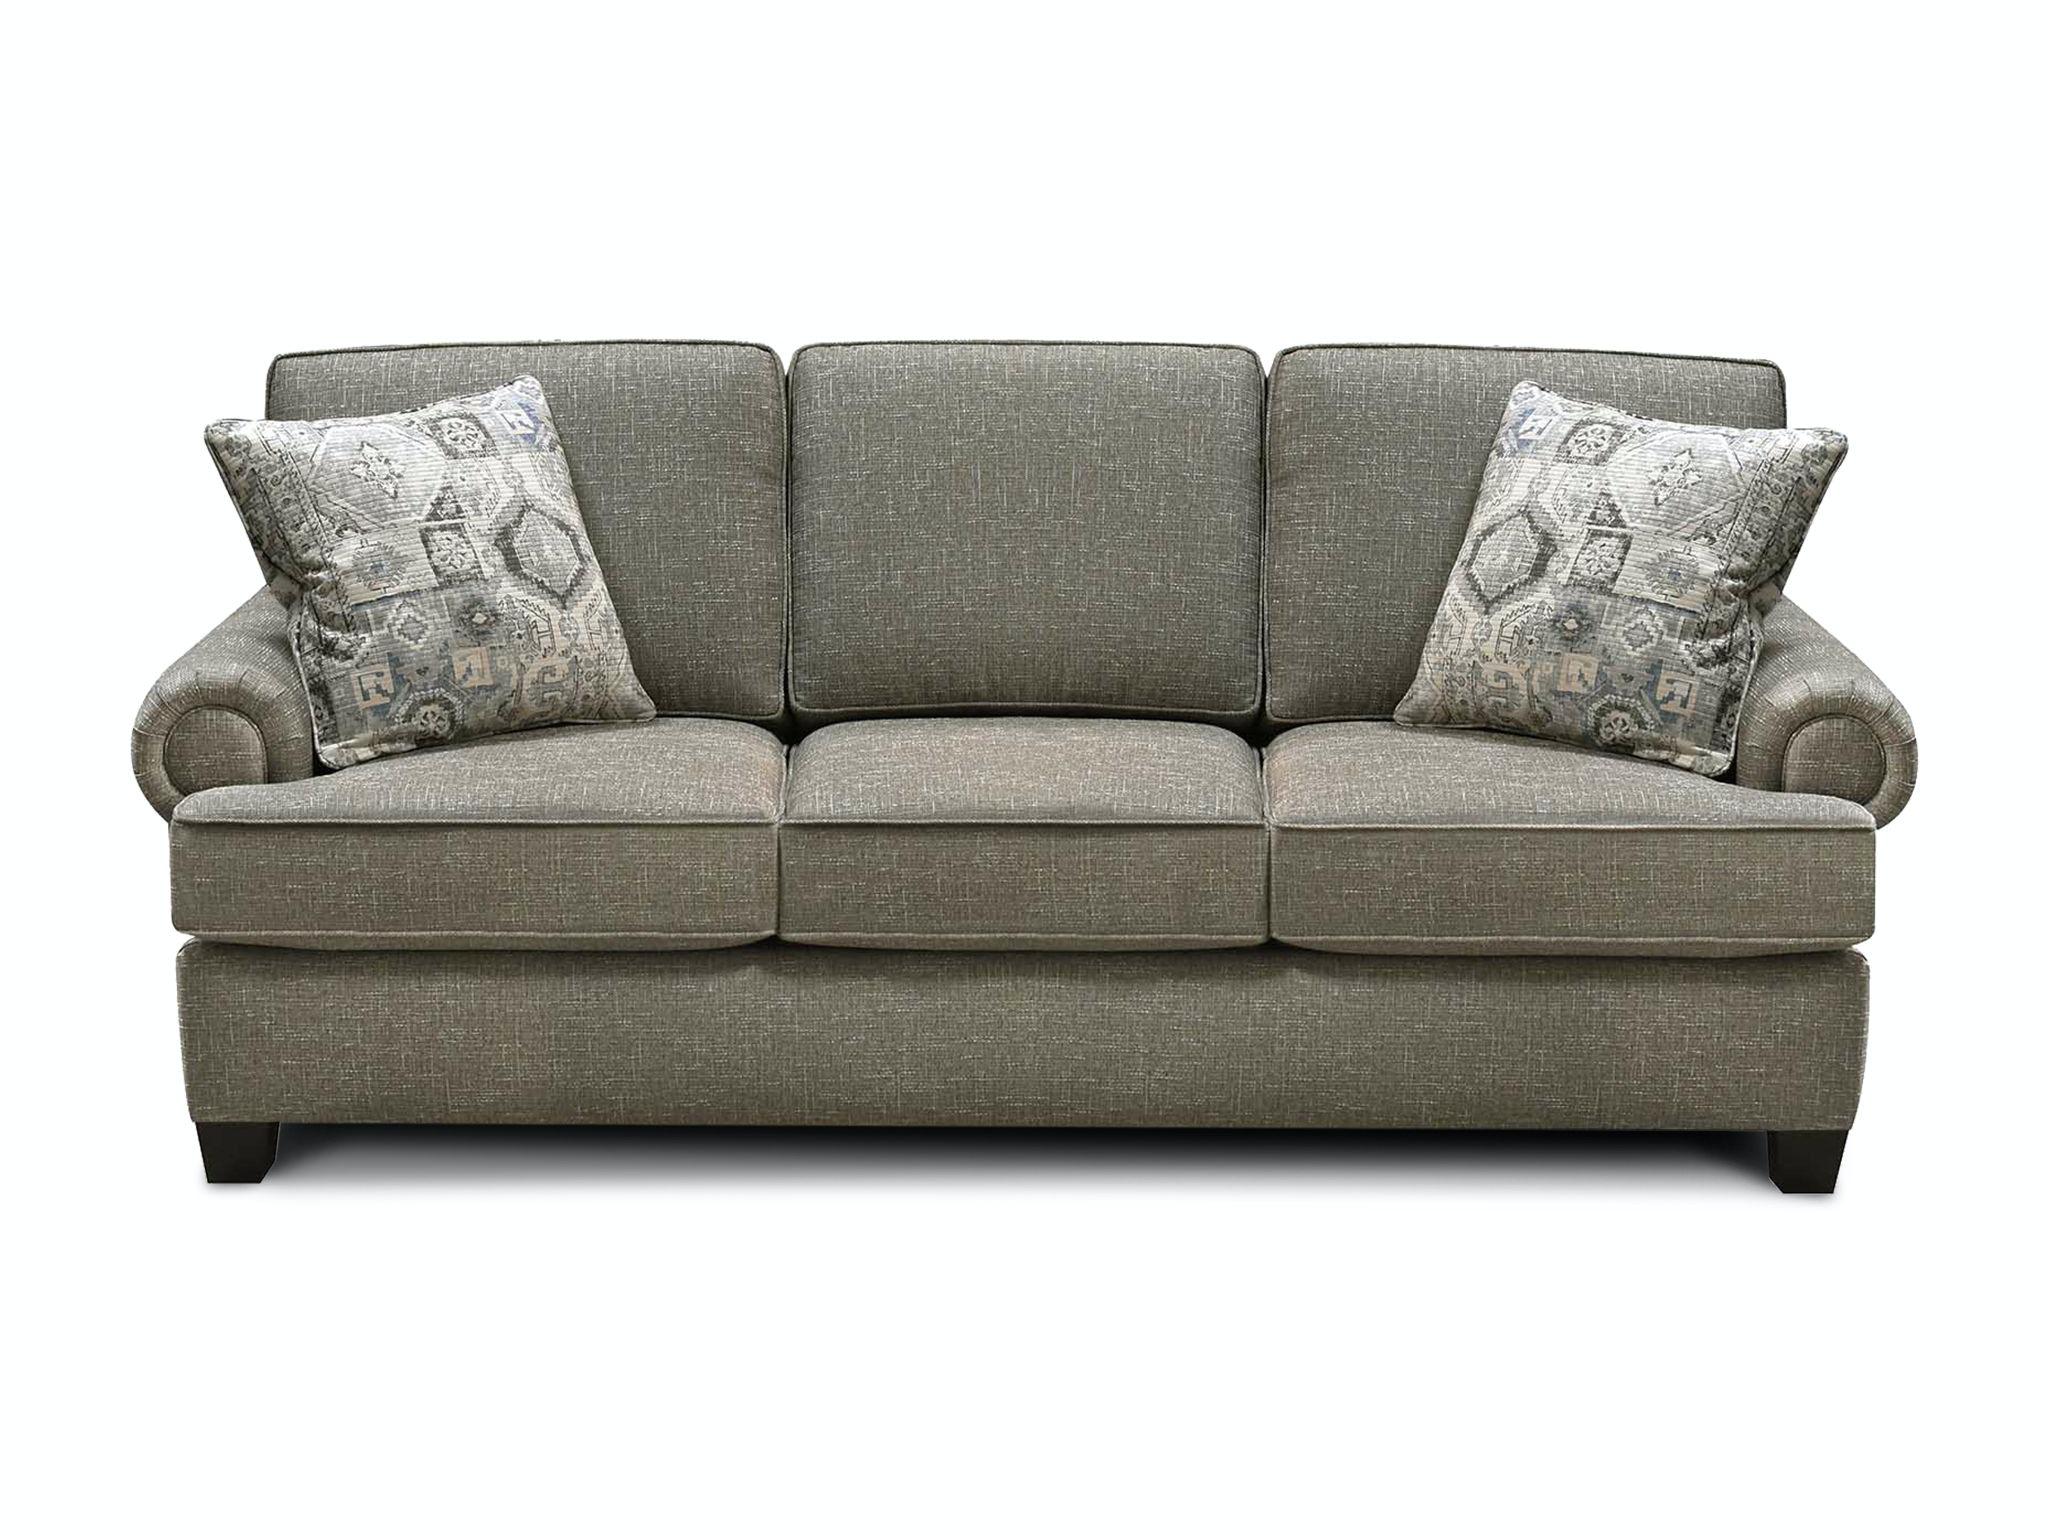 sofas furniture england furniture new tazewell tn rh englandfurniture com